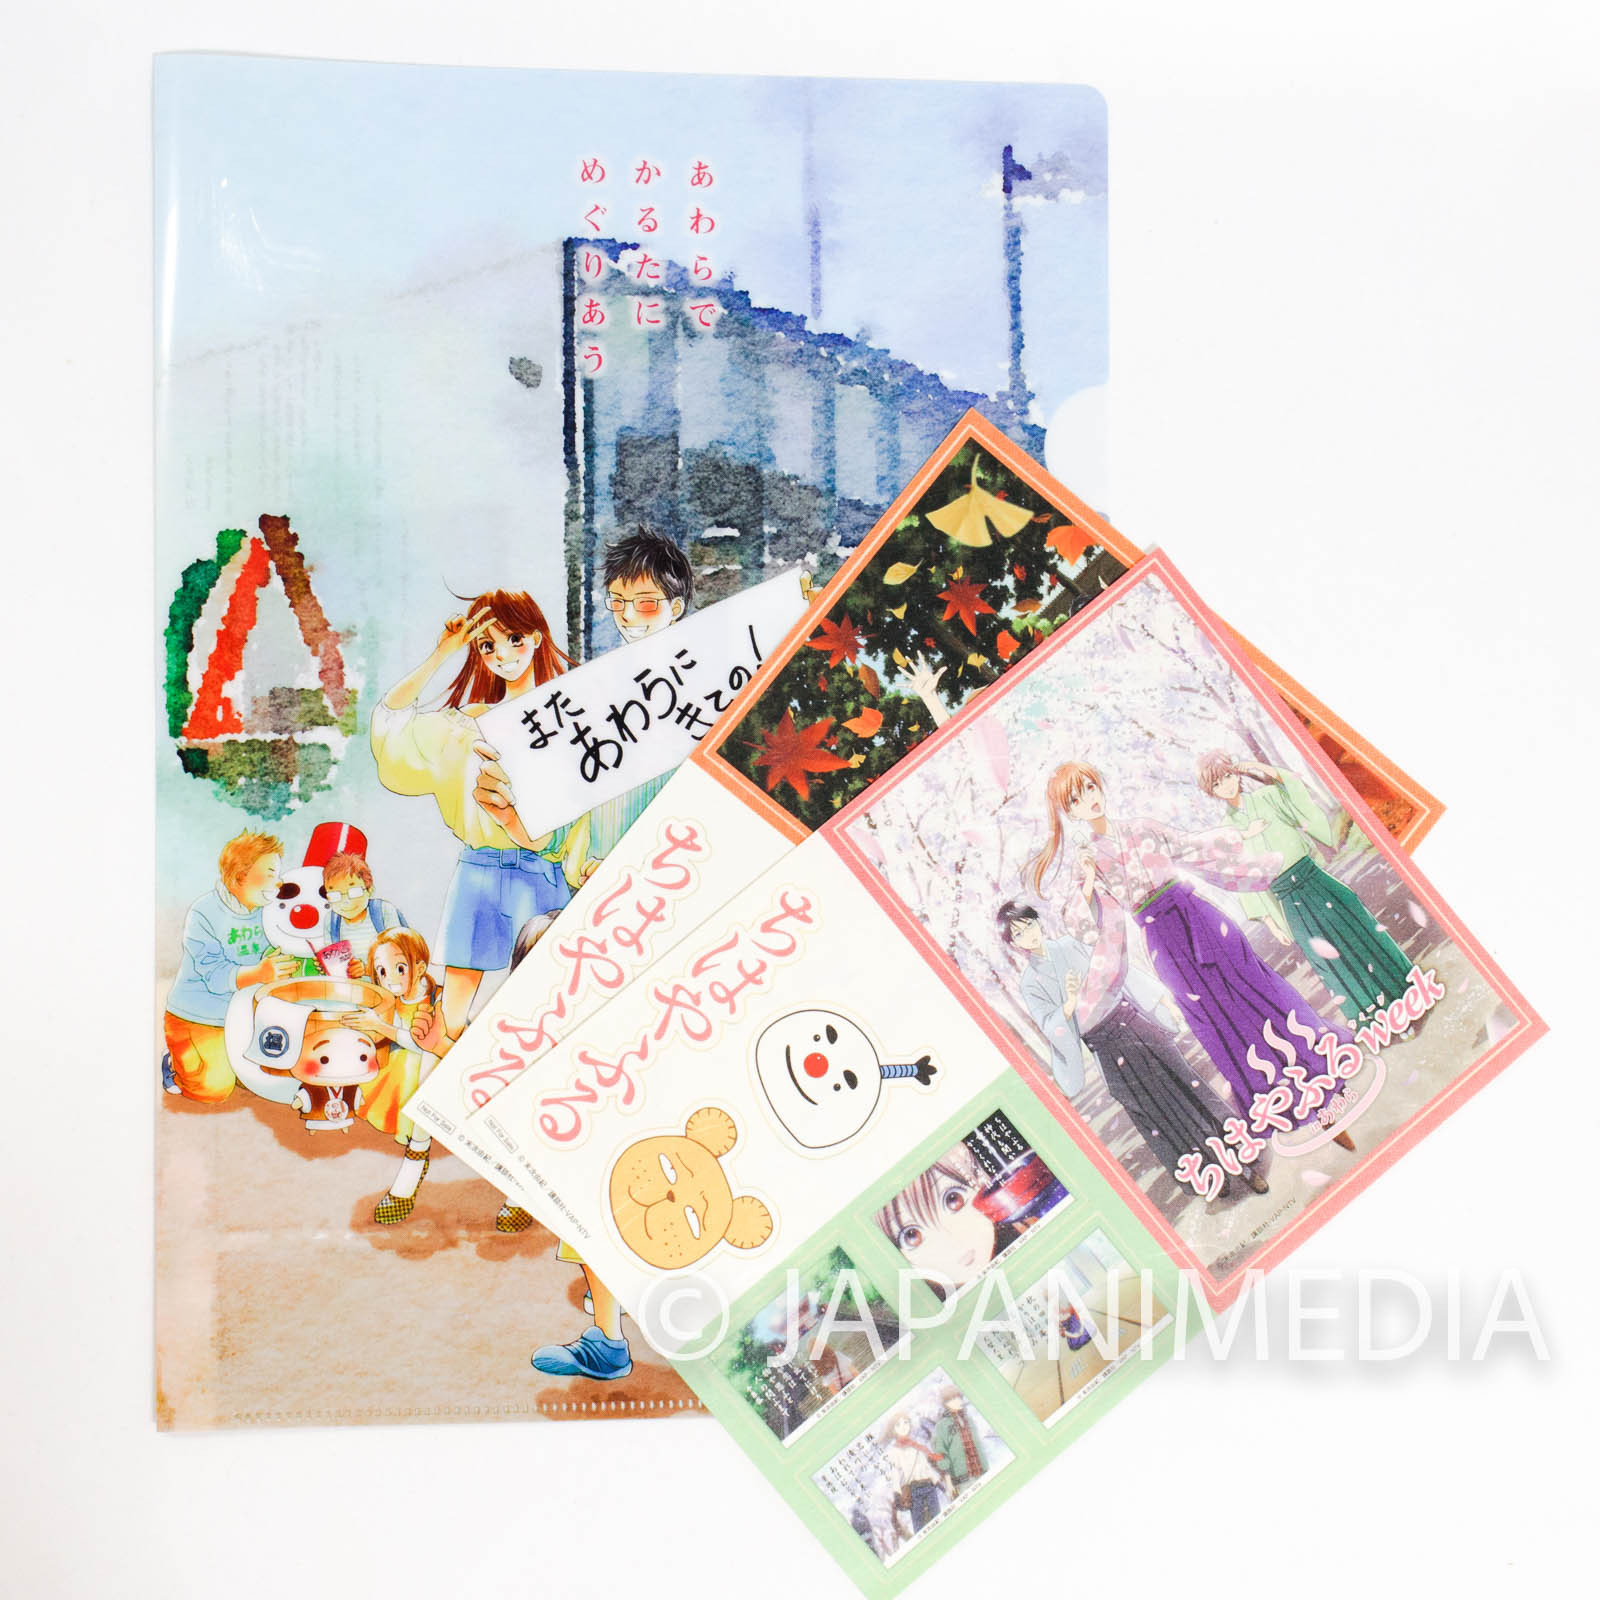 Chihayafuru Clear File Folder Set [Clear File Folder / Stecker x 2 sheet] Chihayafuru week in Awara JAPAN ANIME